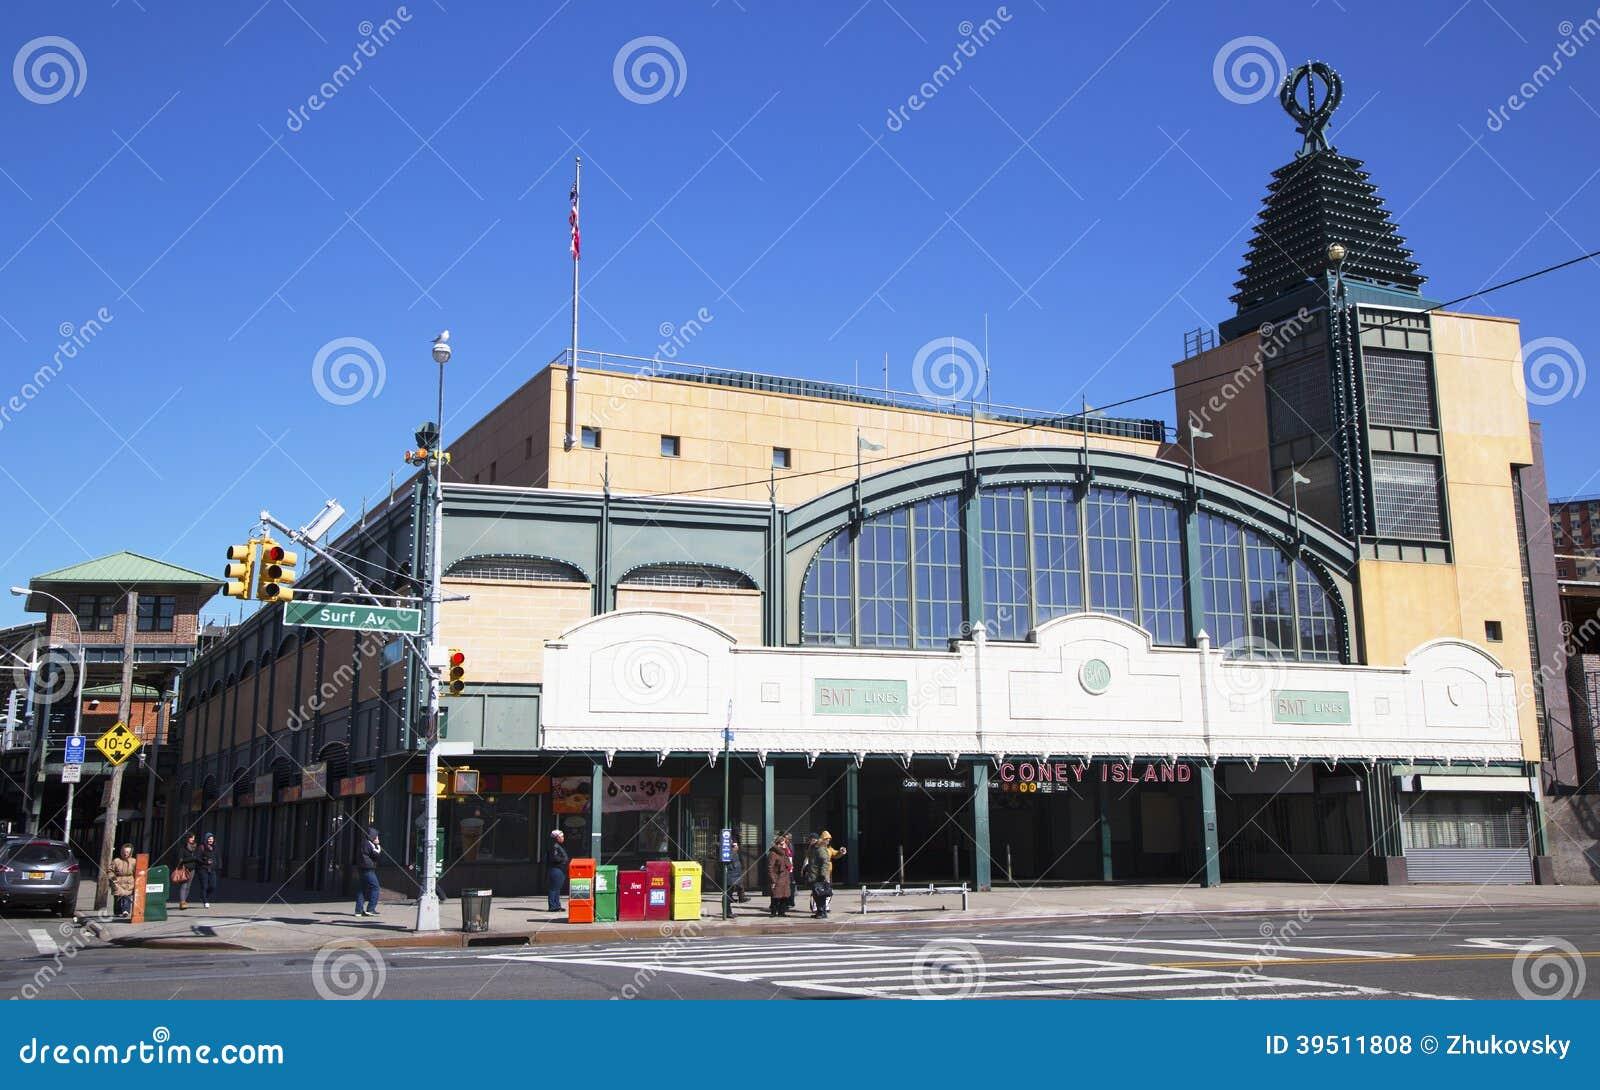 Stillwell Avenue Subwa... Subway Vector